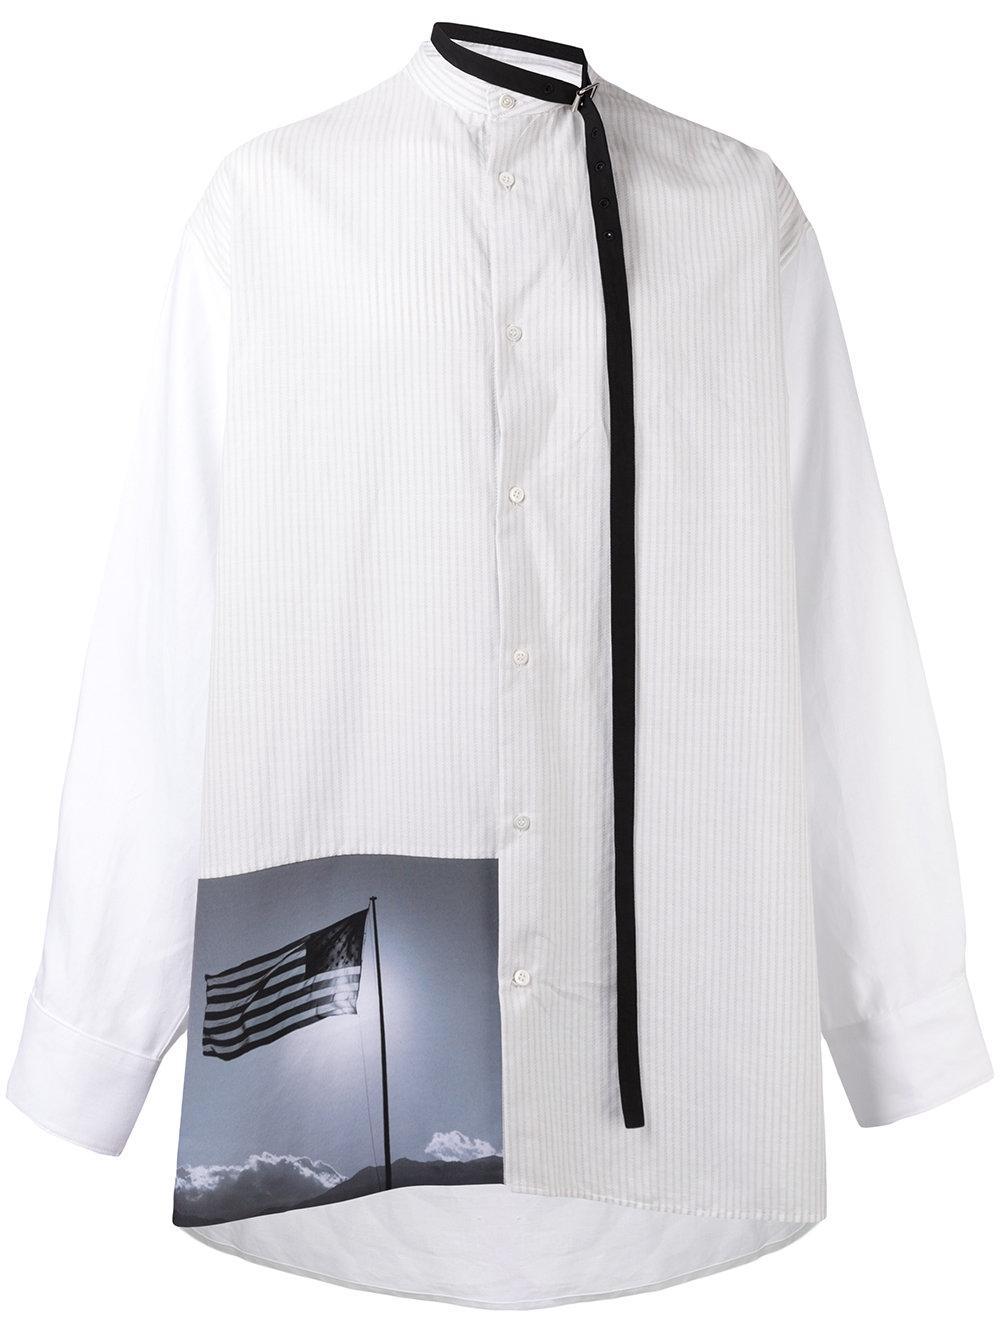 Raf simons x robert mapplethorpe patch print shirt in for Raf simons robert mapplethorpe shirt